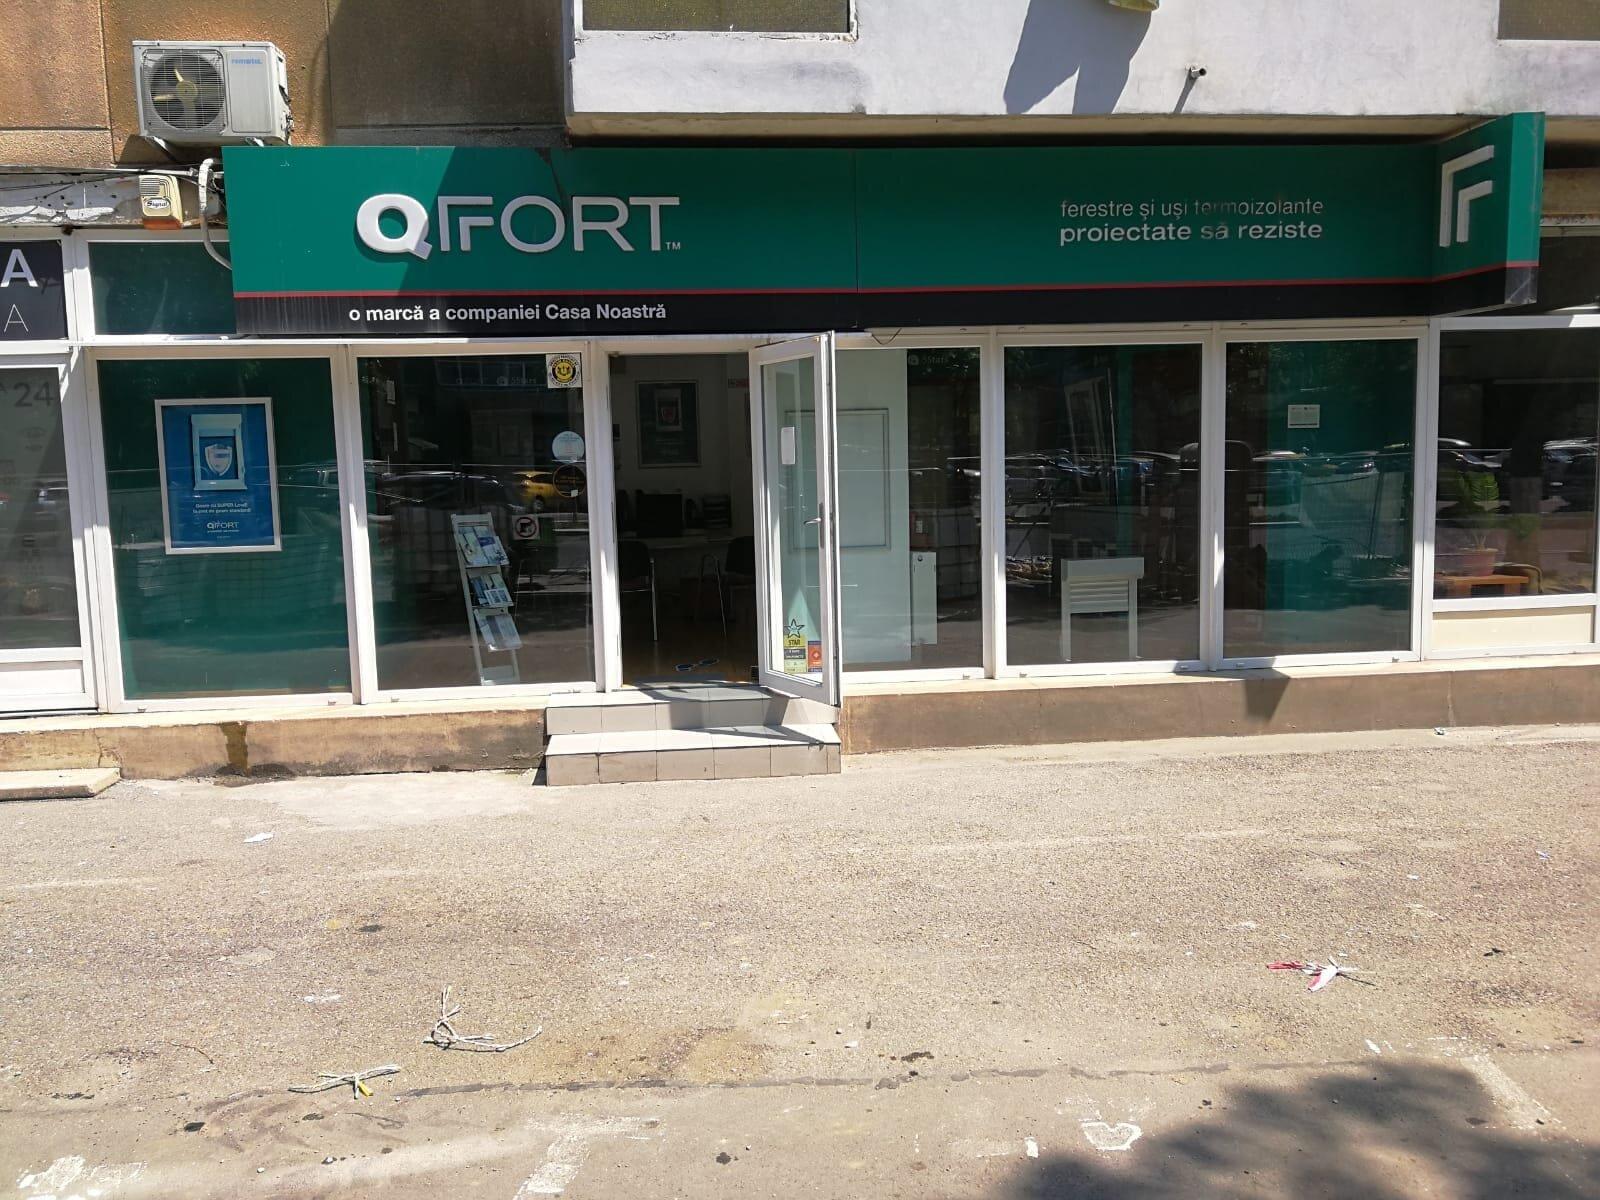 Showroom QFORT - București, Sector 4, Bulevardul Alexandru Obregia, Nr. 25, Bl. i4